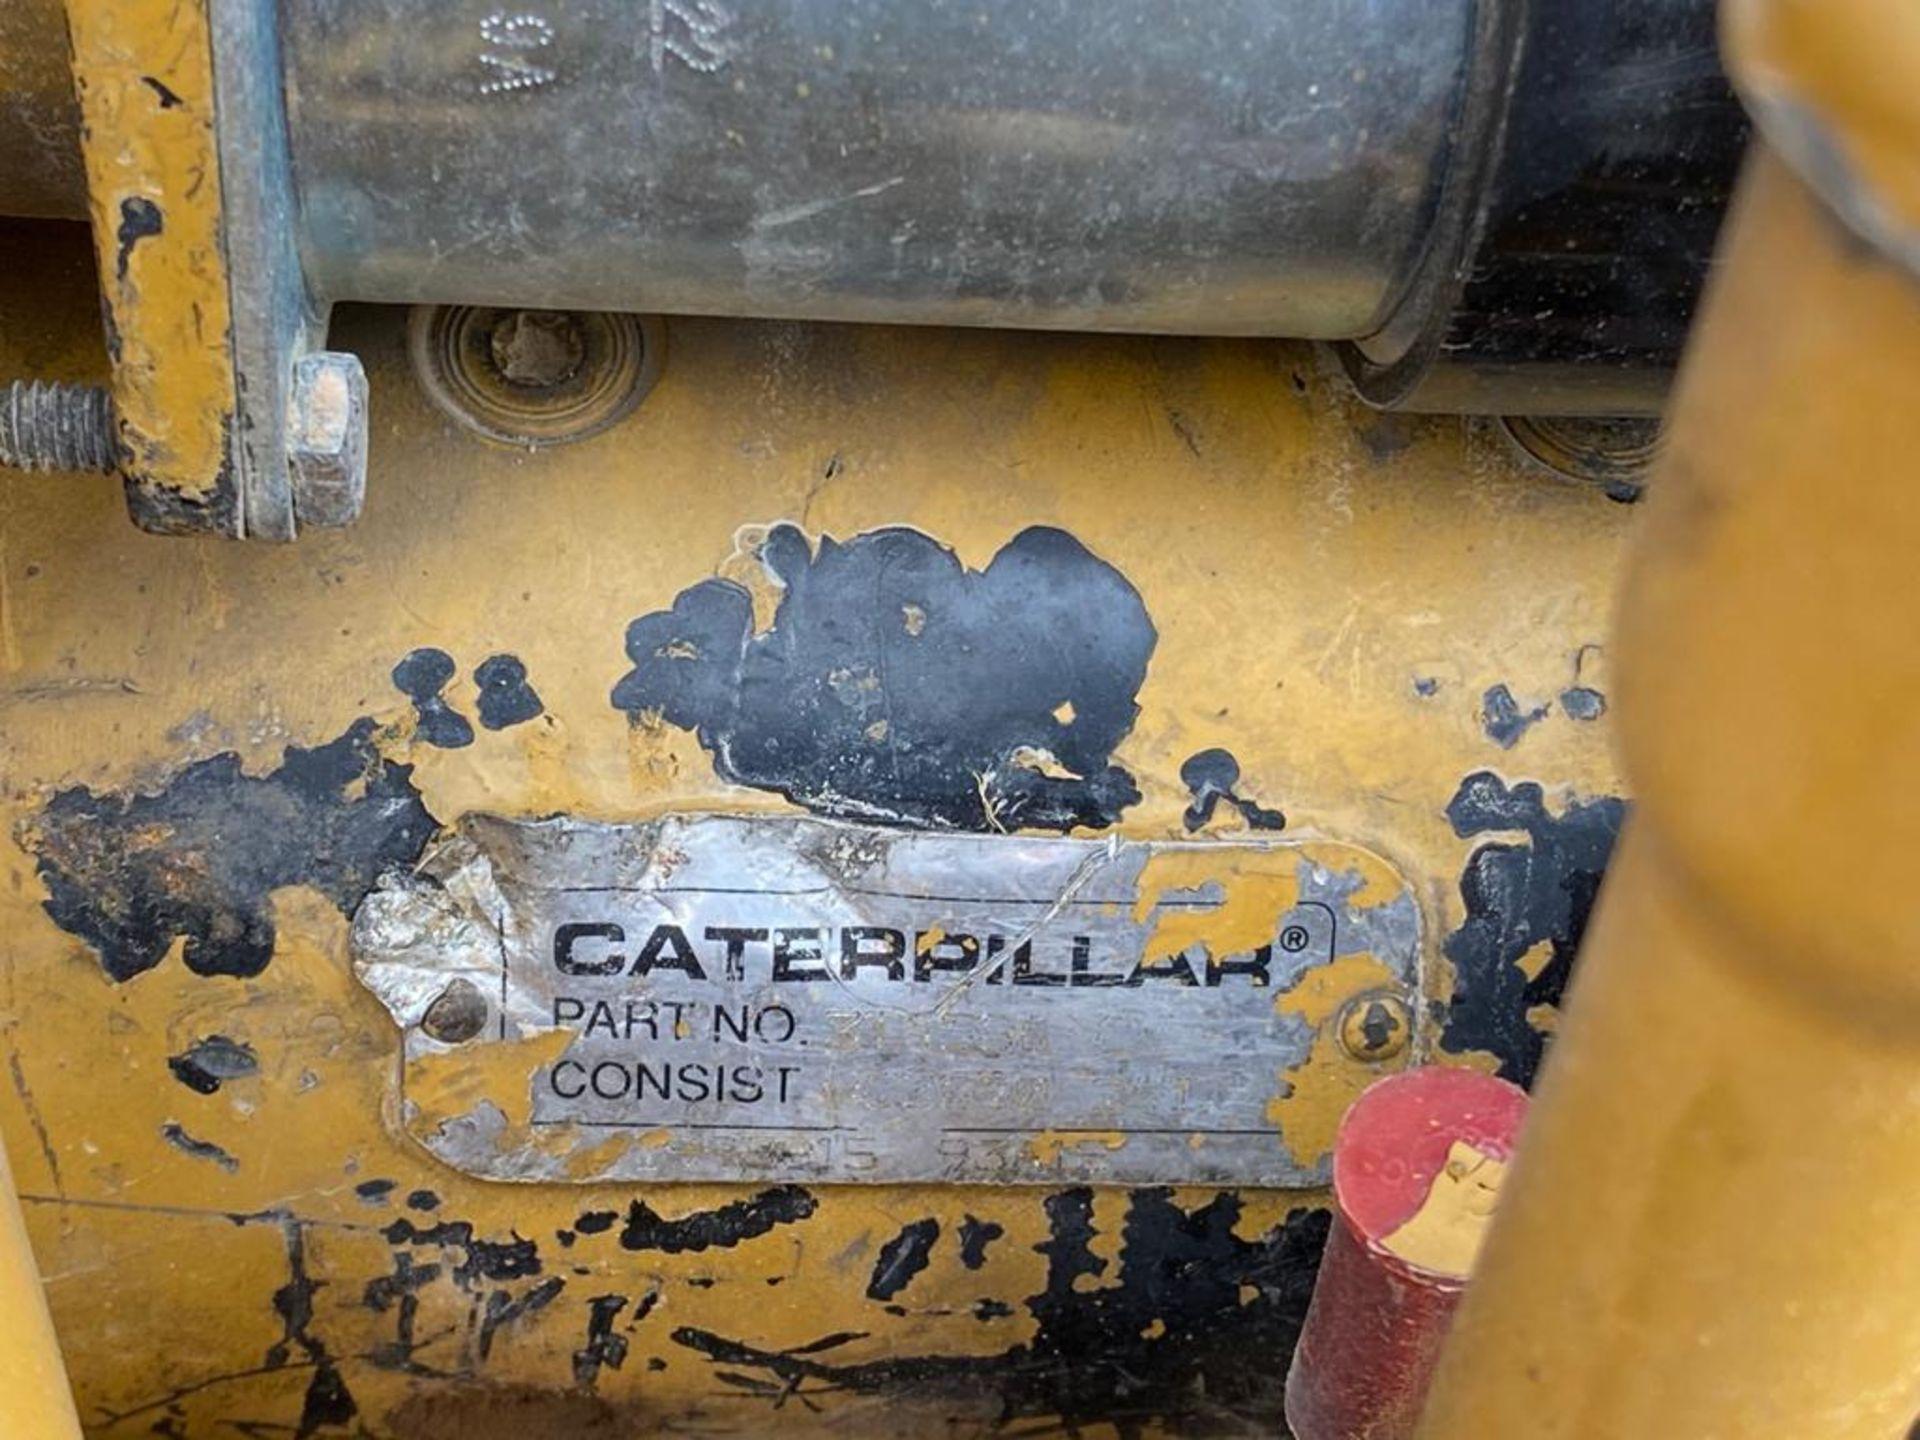 Caterpillar 120G Motor Grader, Serial number 87V09646, Motor number PQ883-2/07Z28983 - Image 58 of 61